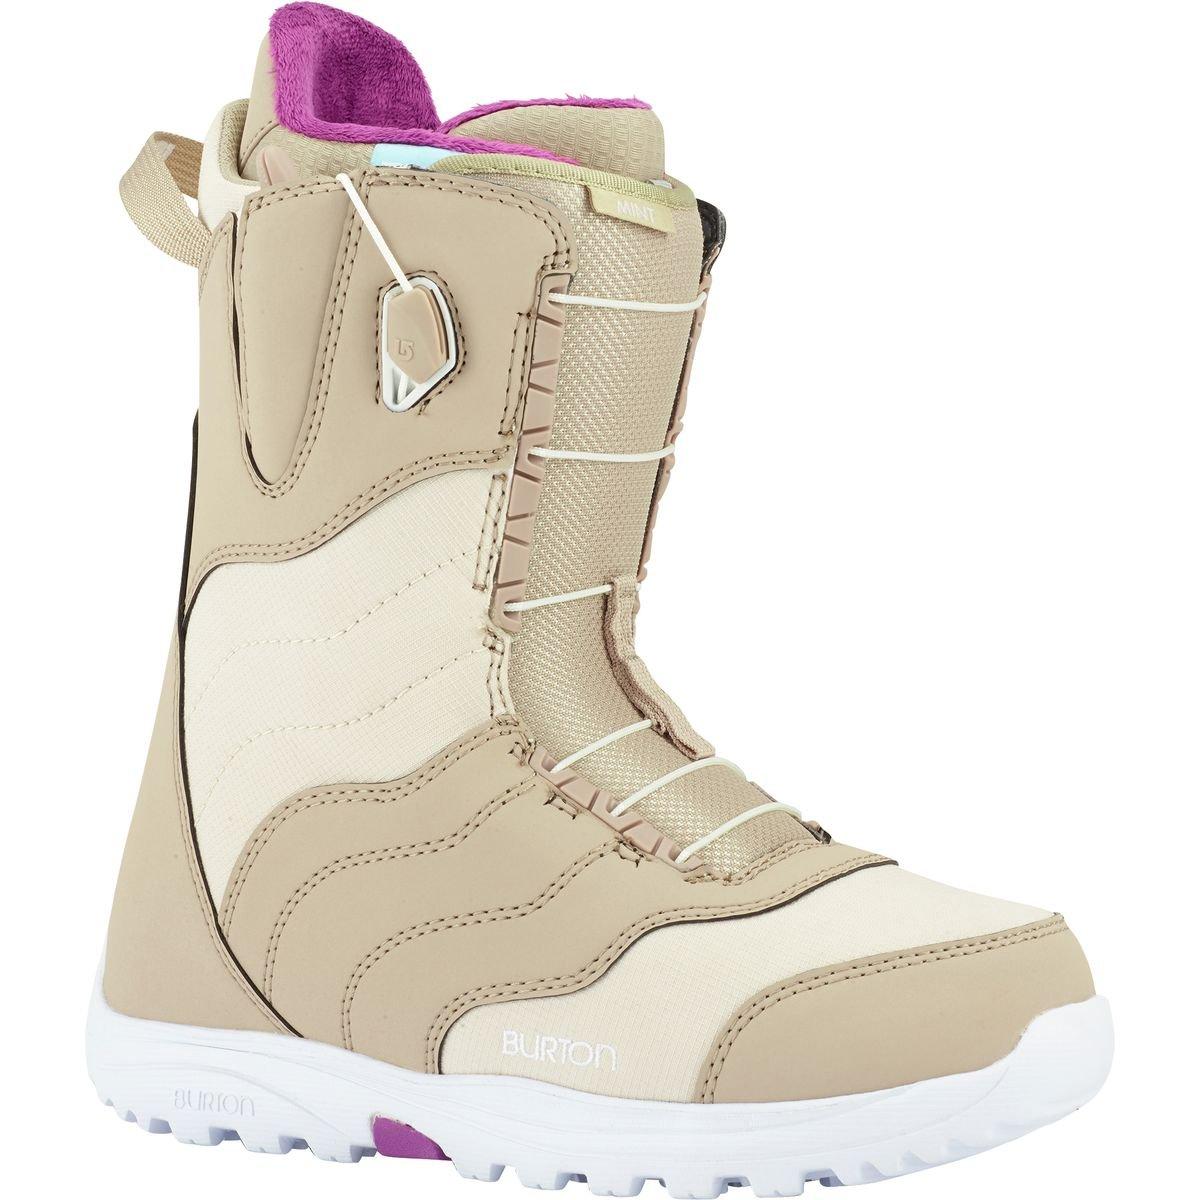 Burton Mint Snowboard Boot 2018 - Women's Tan 7.5 by Burton